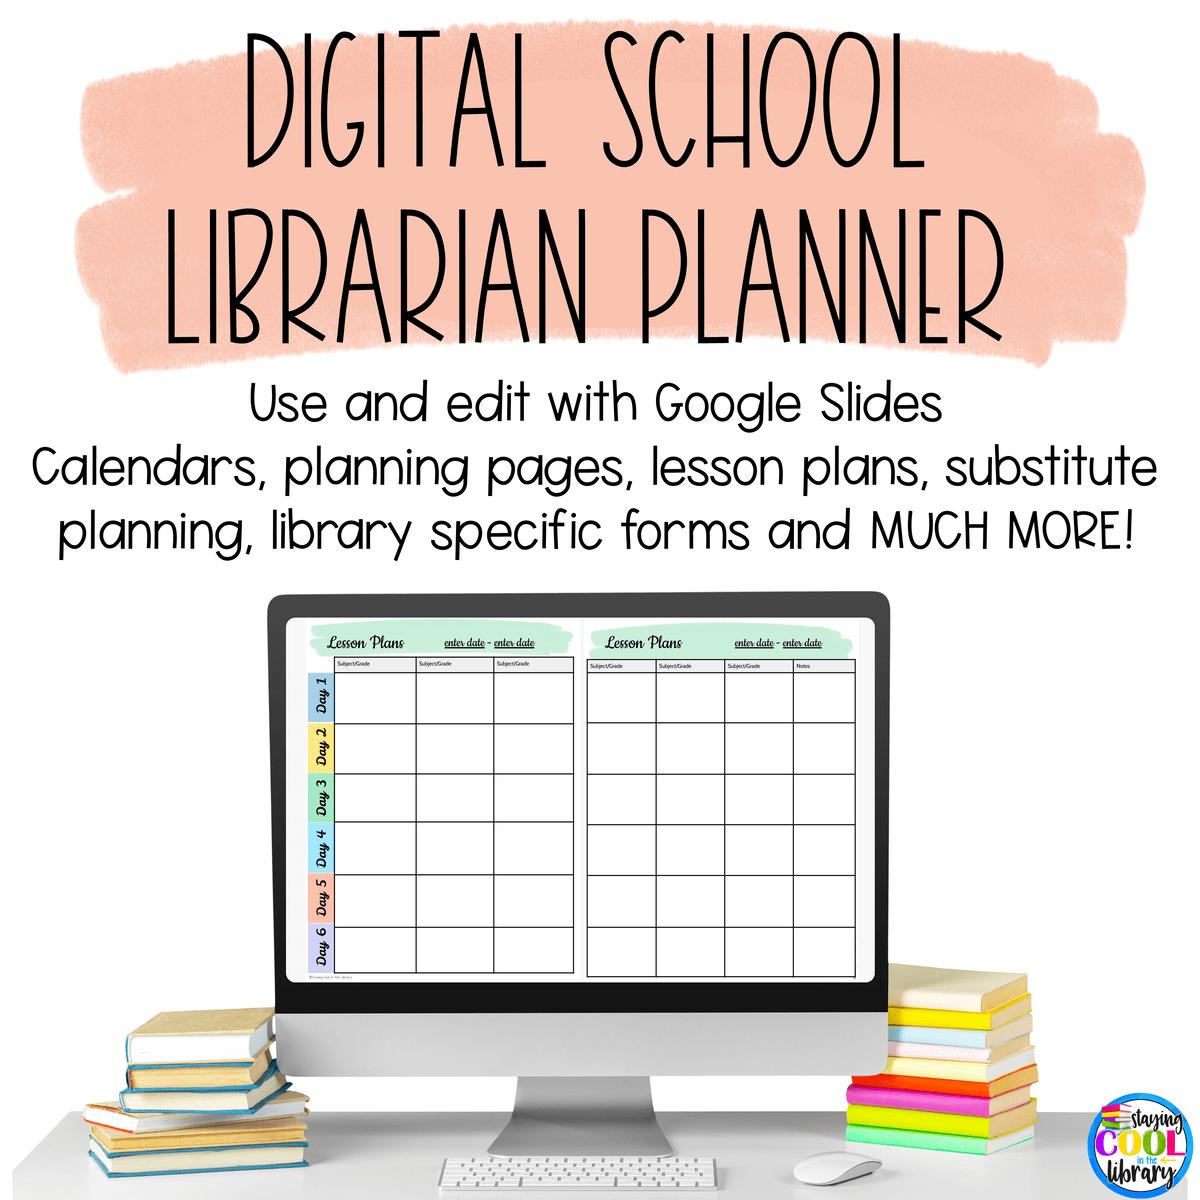 Digital School Library Planner (Google Slides) in 2020